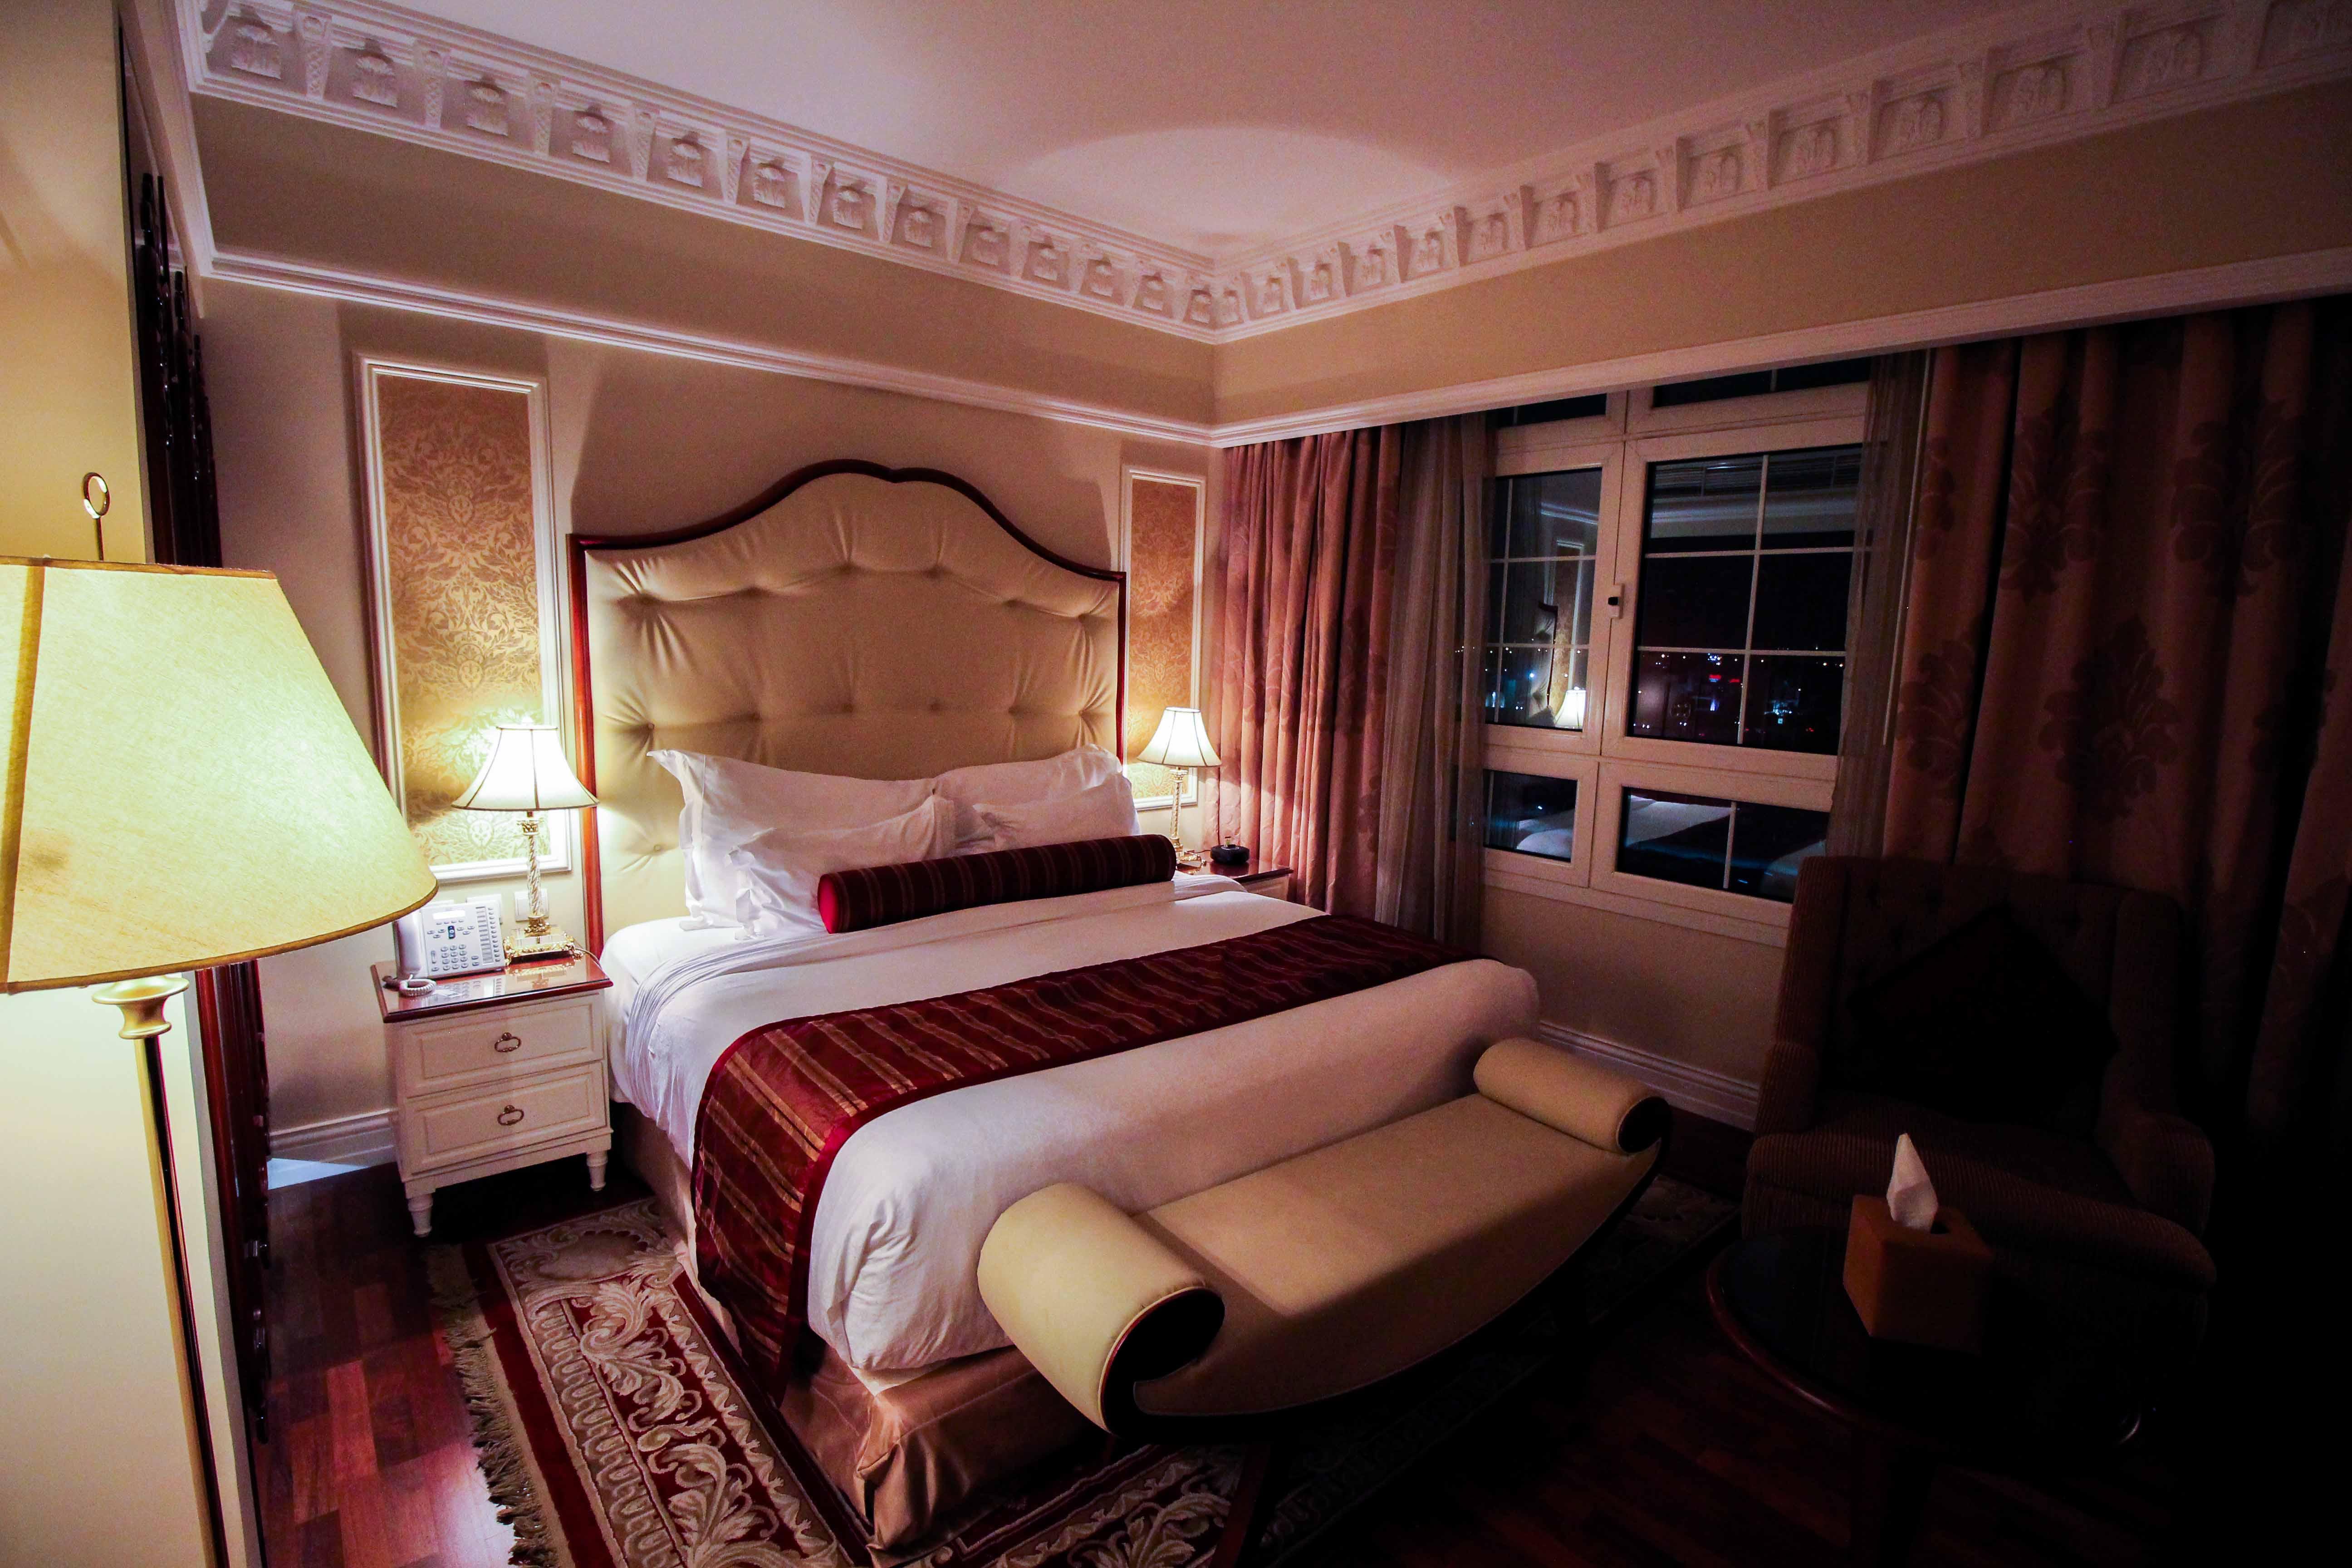 Warwick Hotel Doha Executive Room Luxushotel 5 Sterne Hotel katar Reiseblog